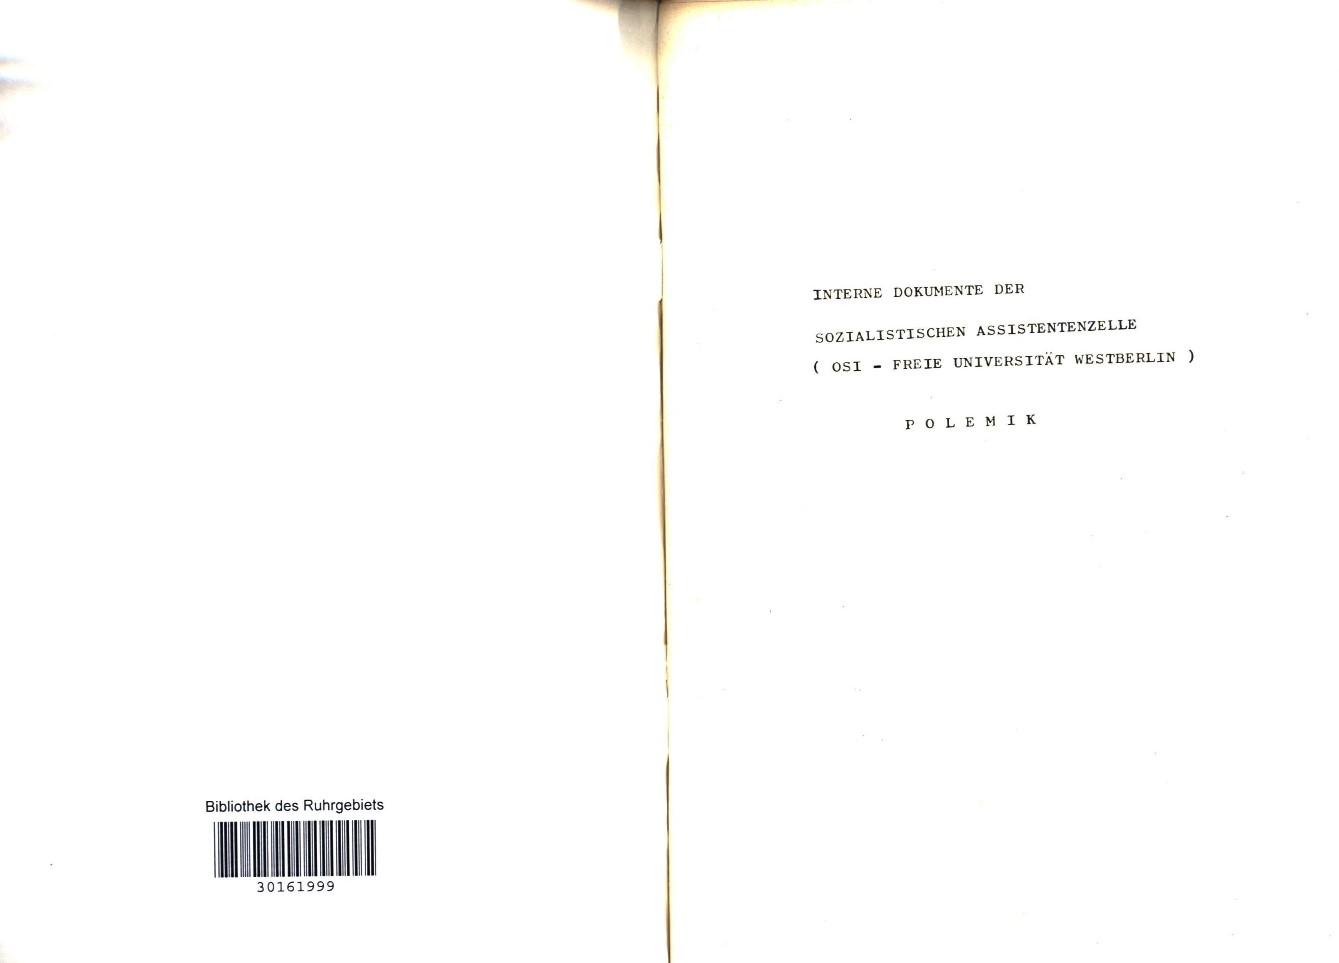 Berlin_KSV_1975_Dokumente_der_SAZ_02